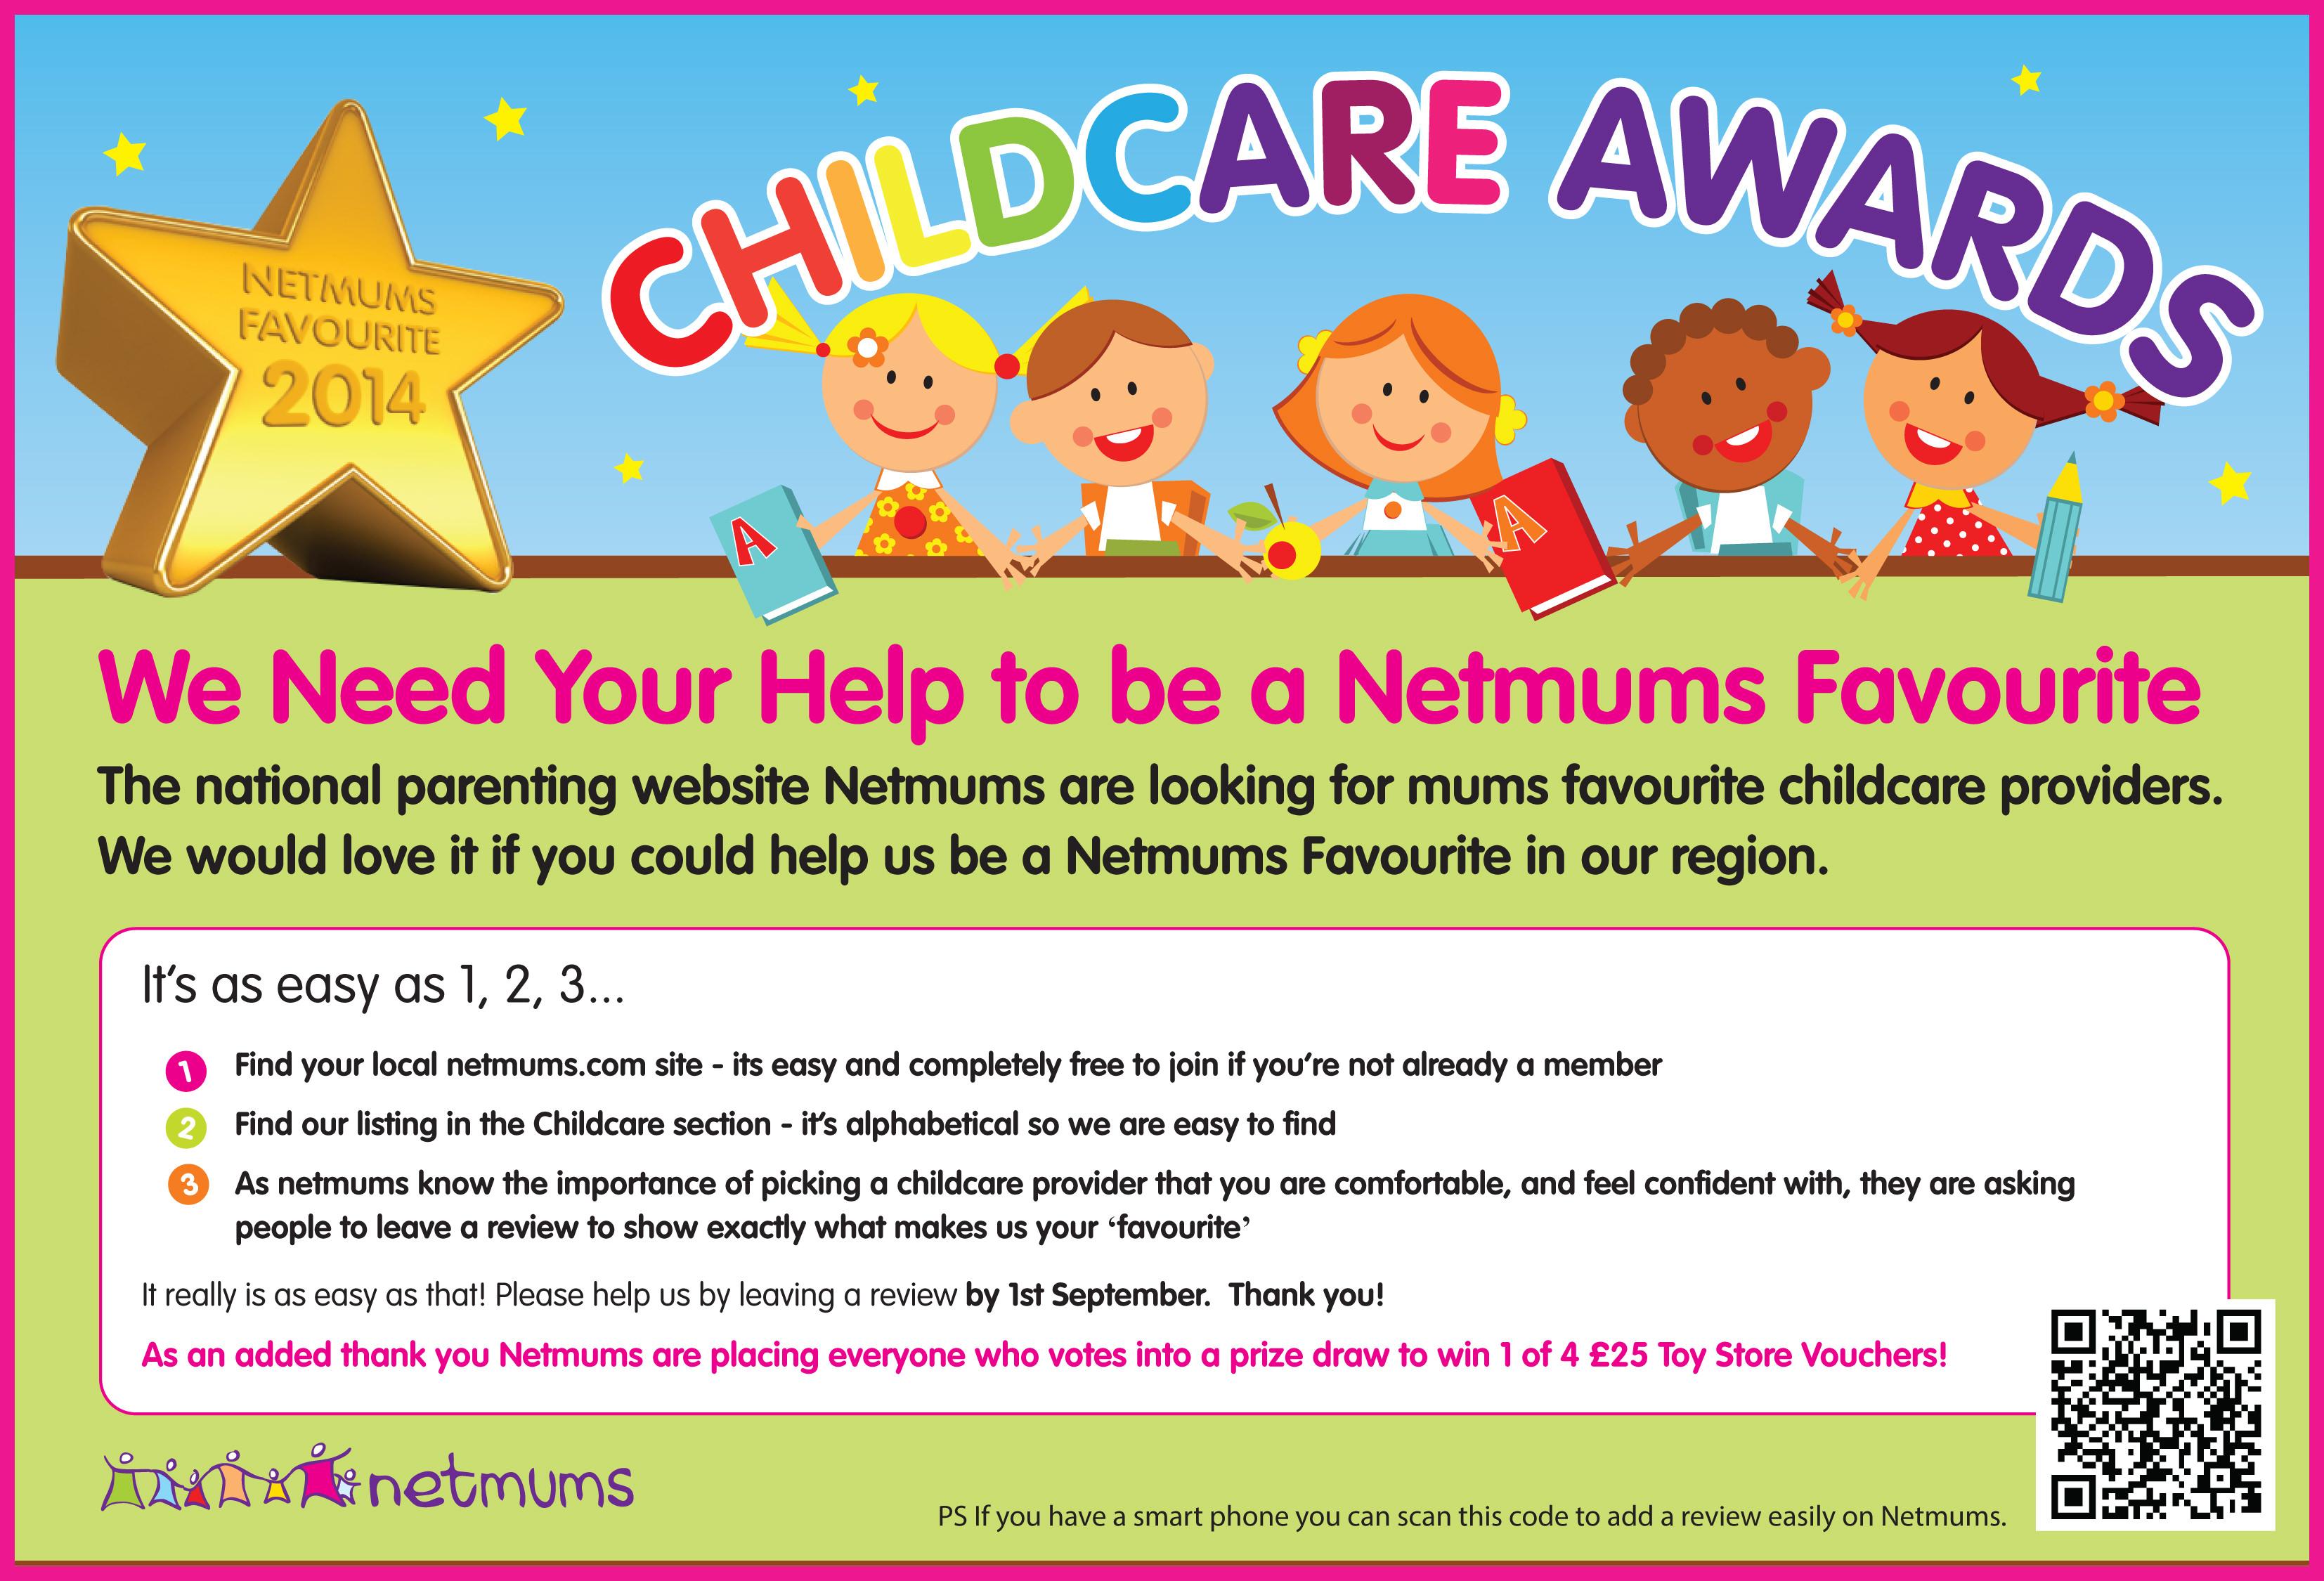 Netmums childcare awards